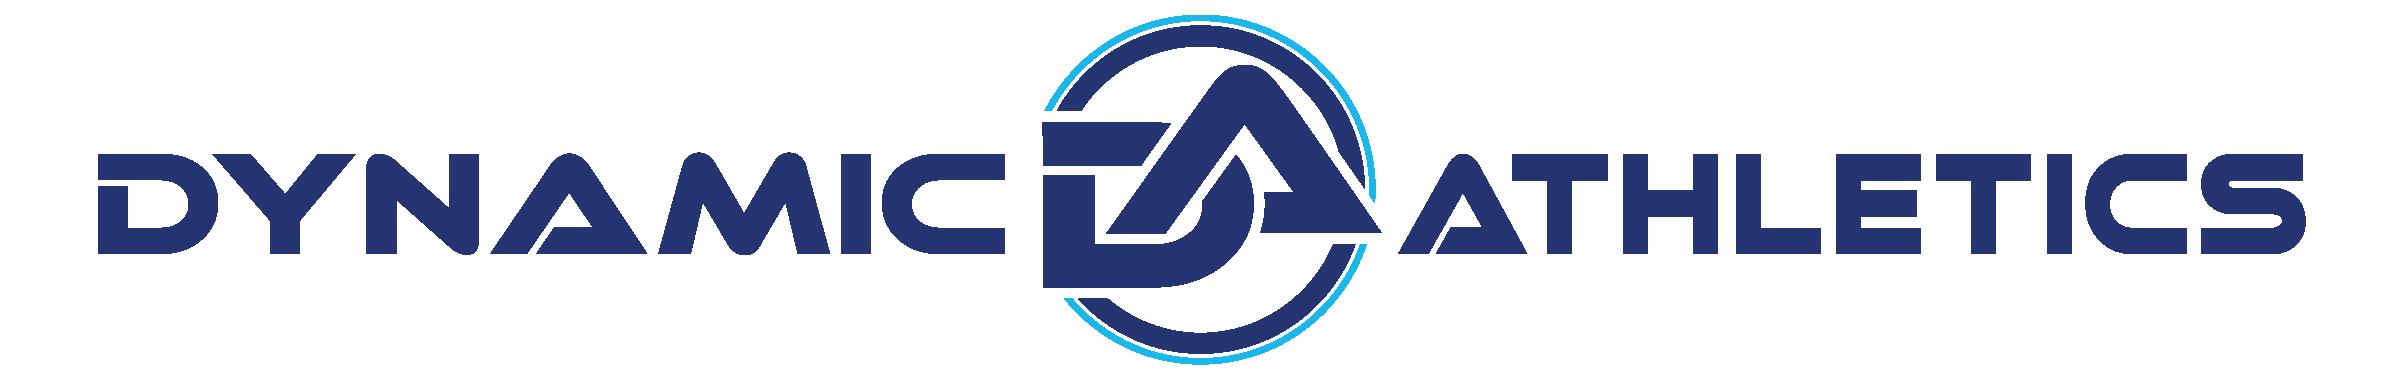 Dynamic Athletics logo